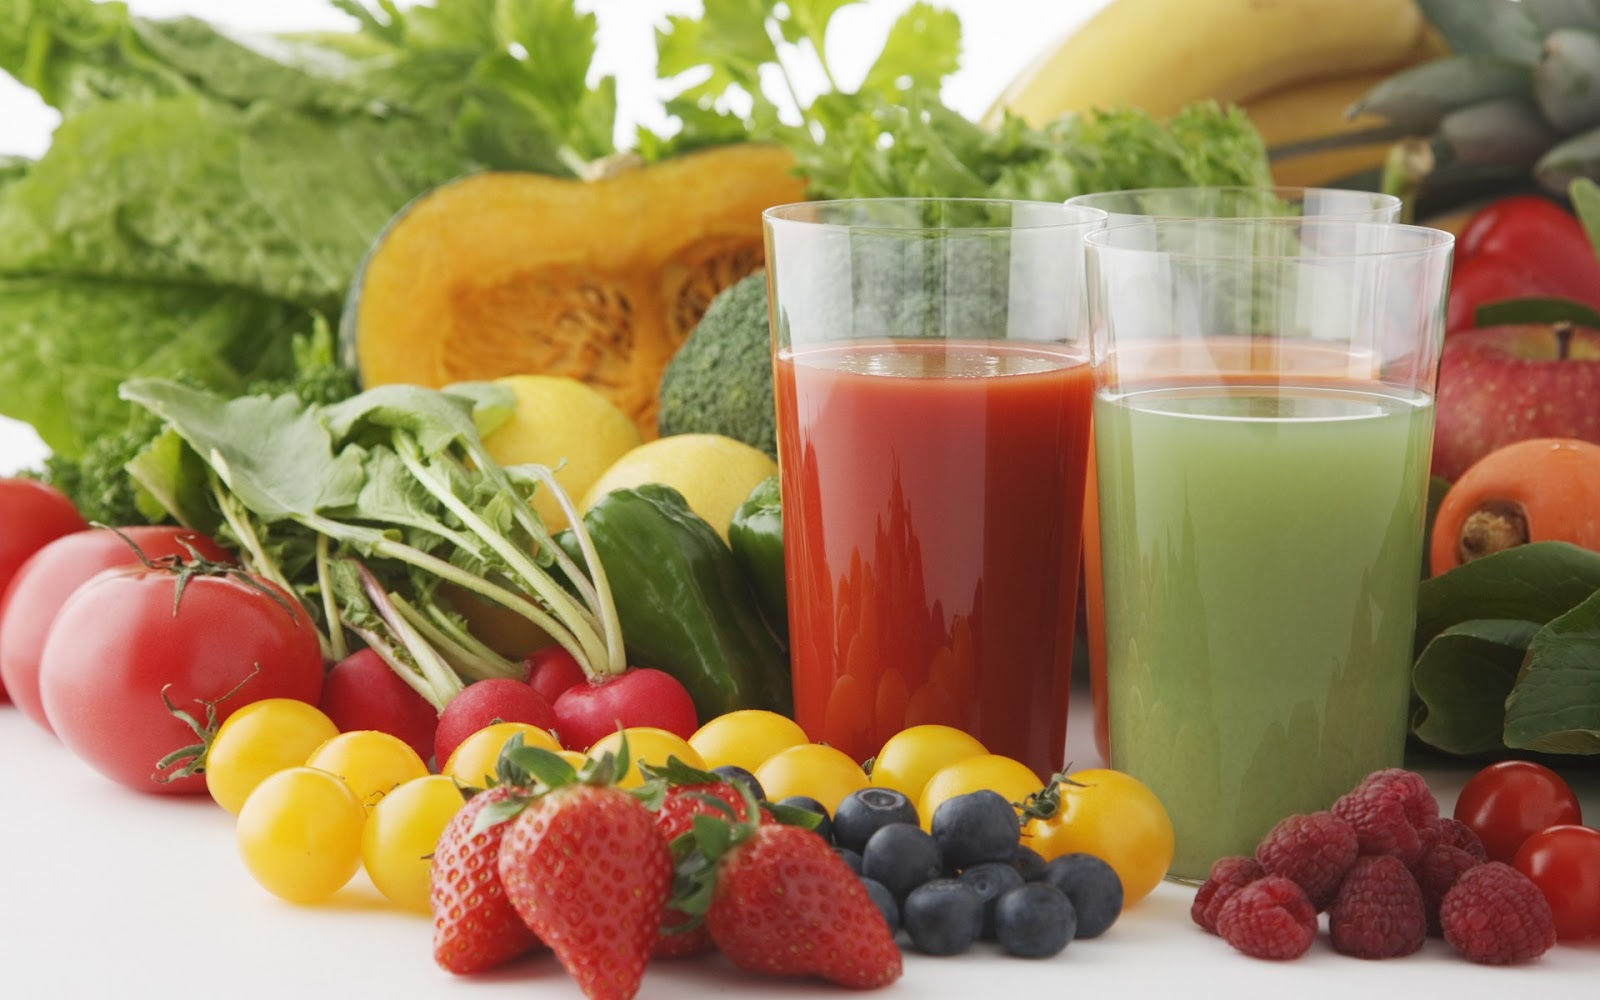 detox you body by juice